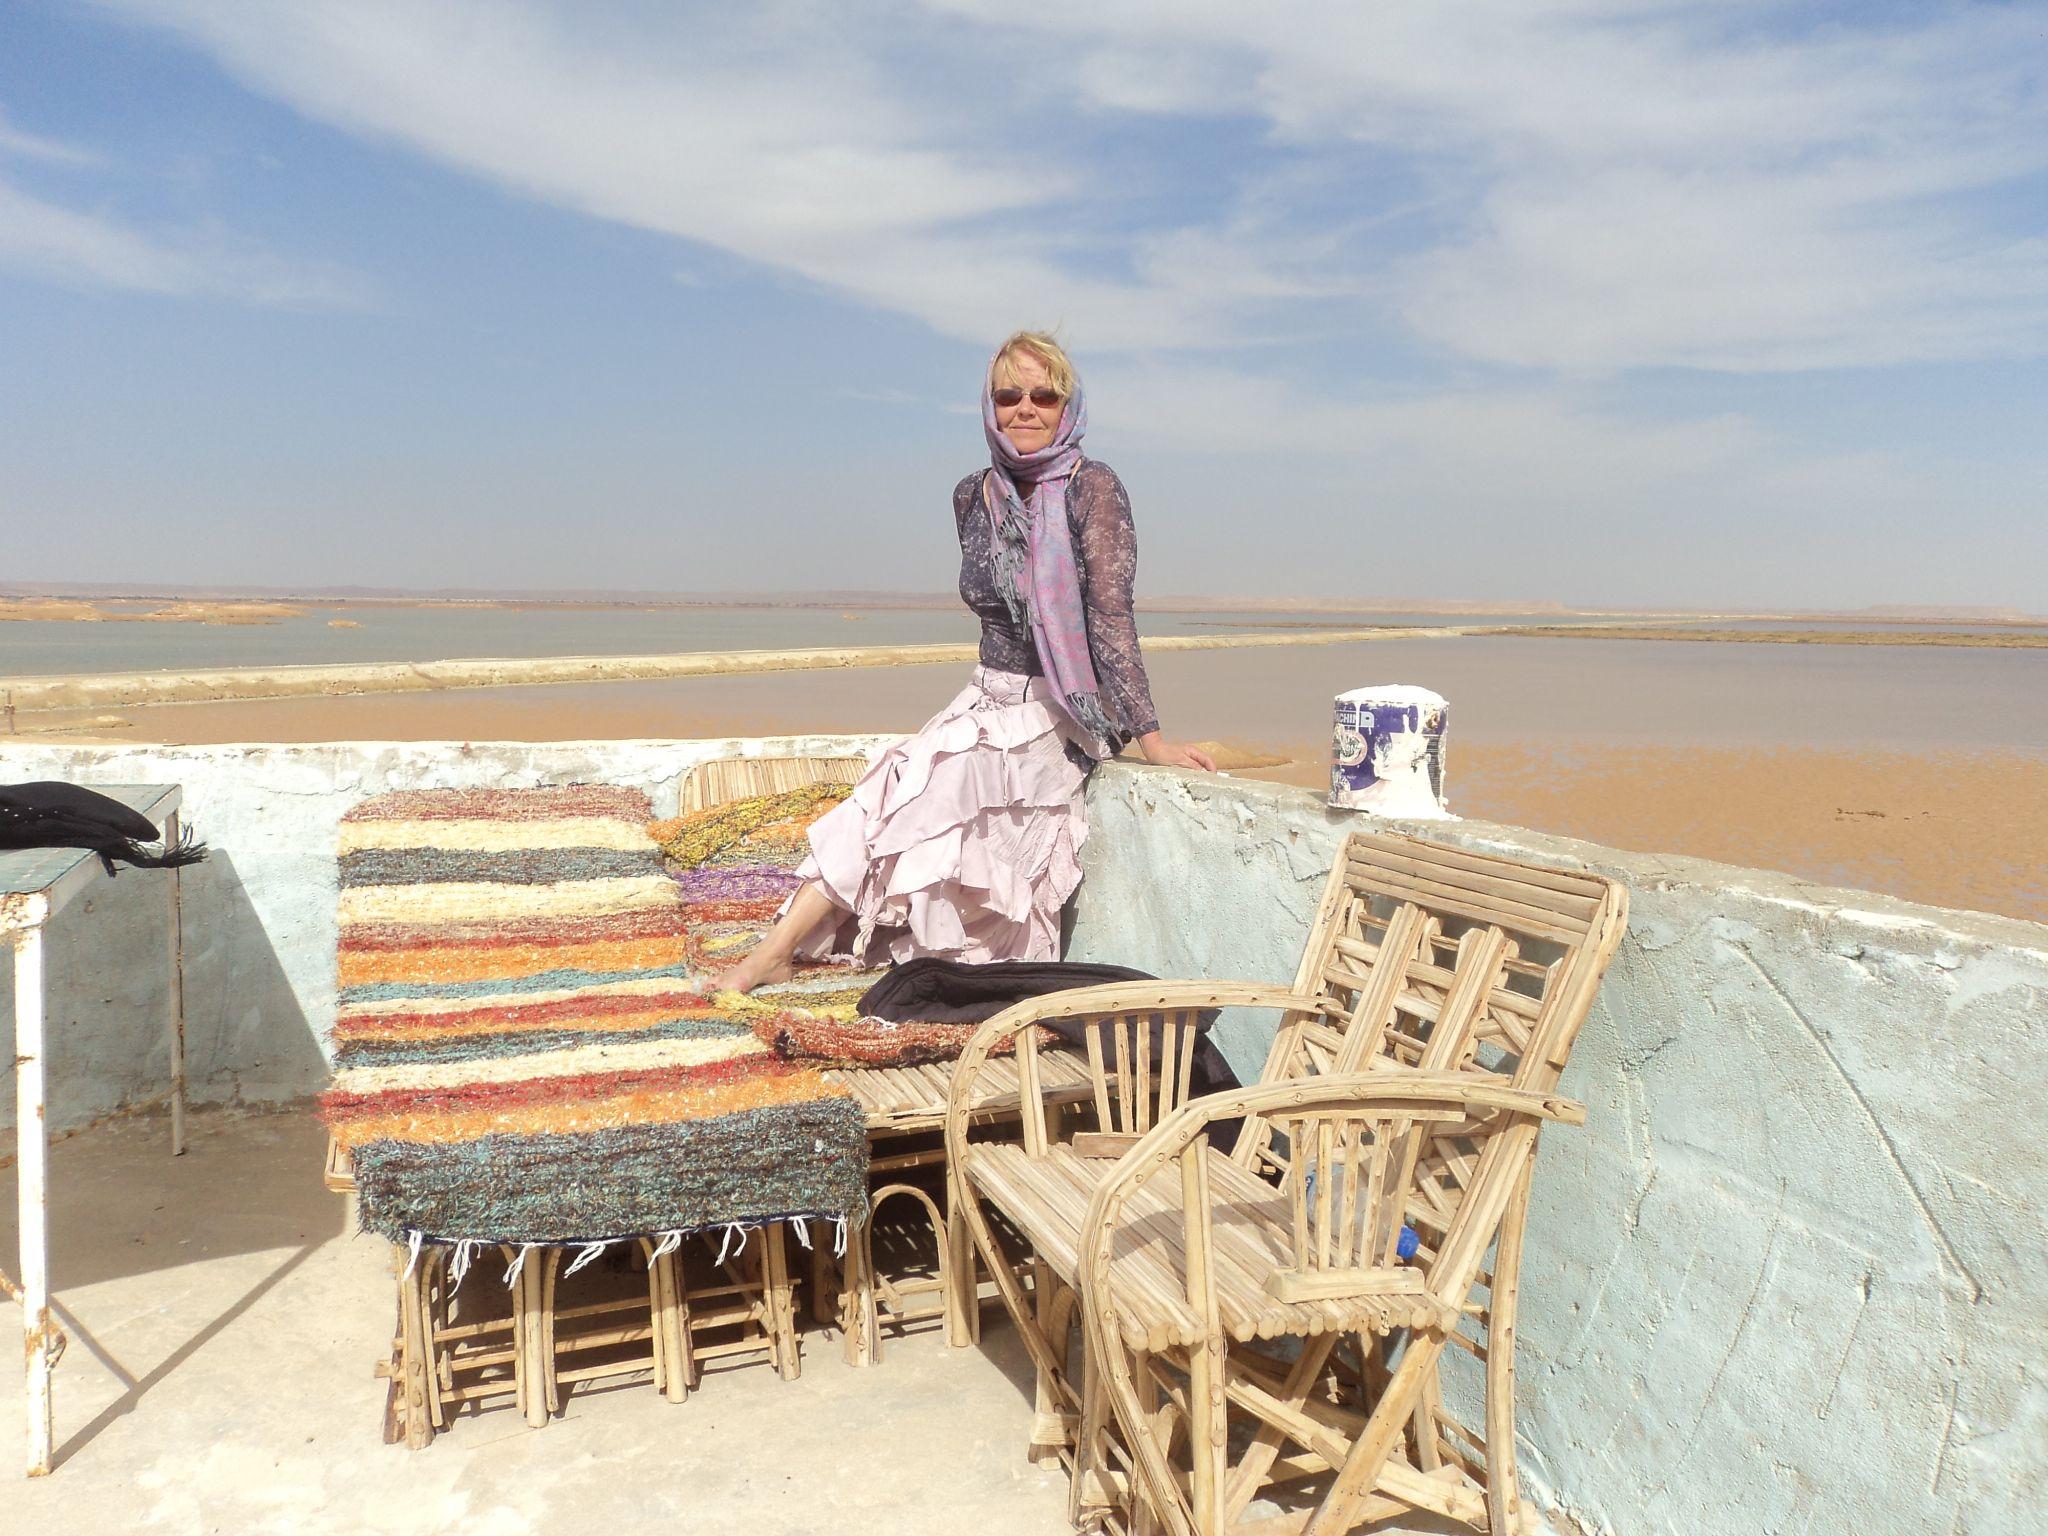 Laura Kamil salt flats, Egypt, 2012 - Siwa oasis by laura.kamil